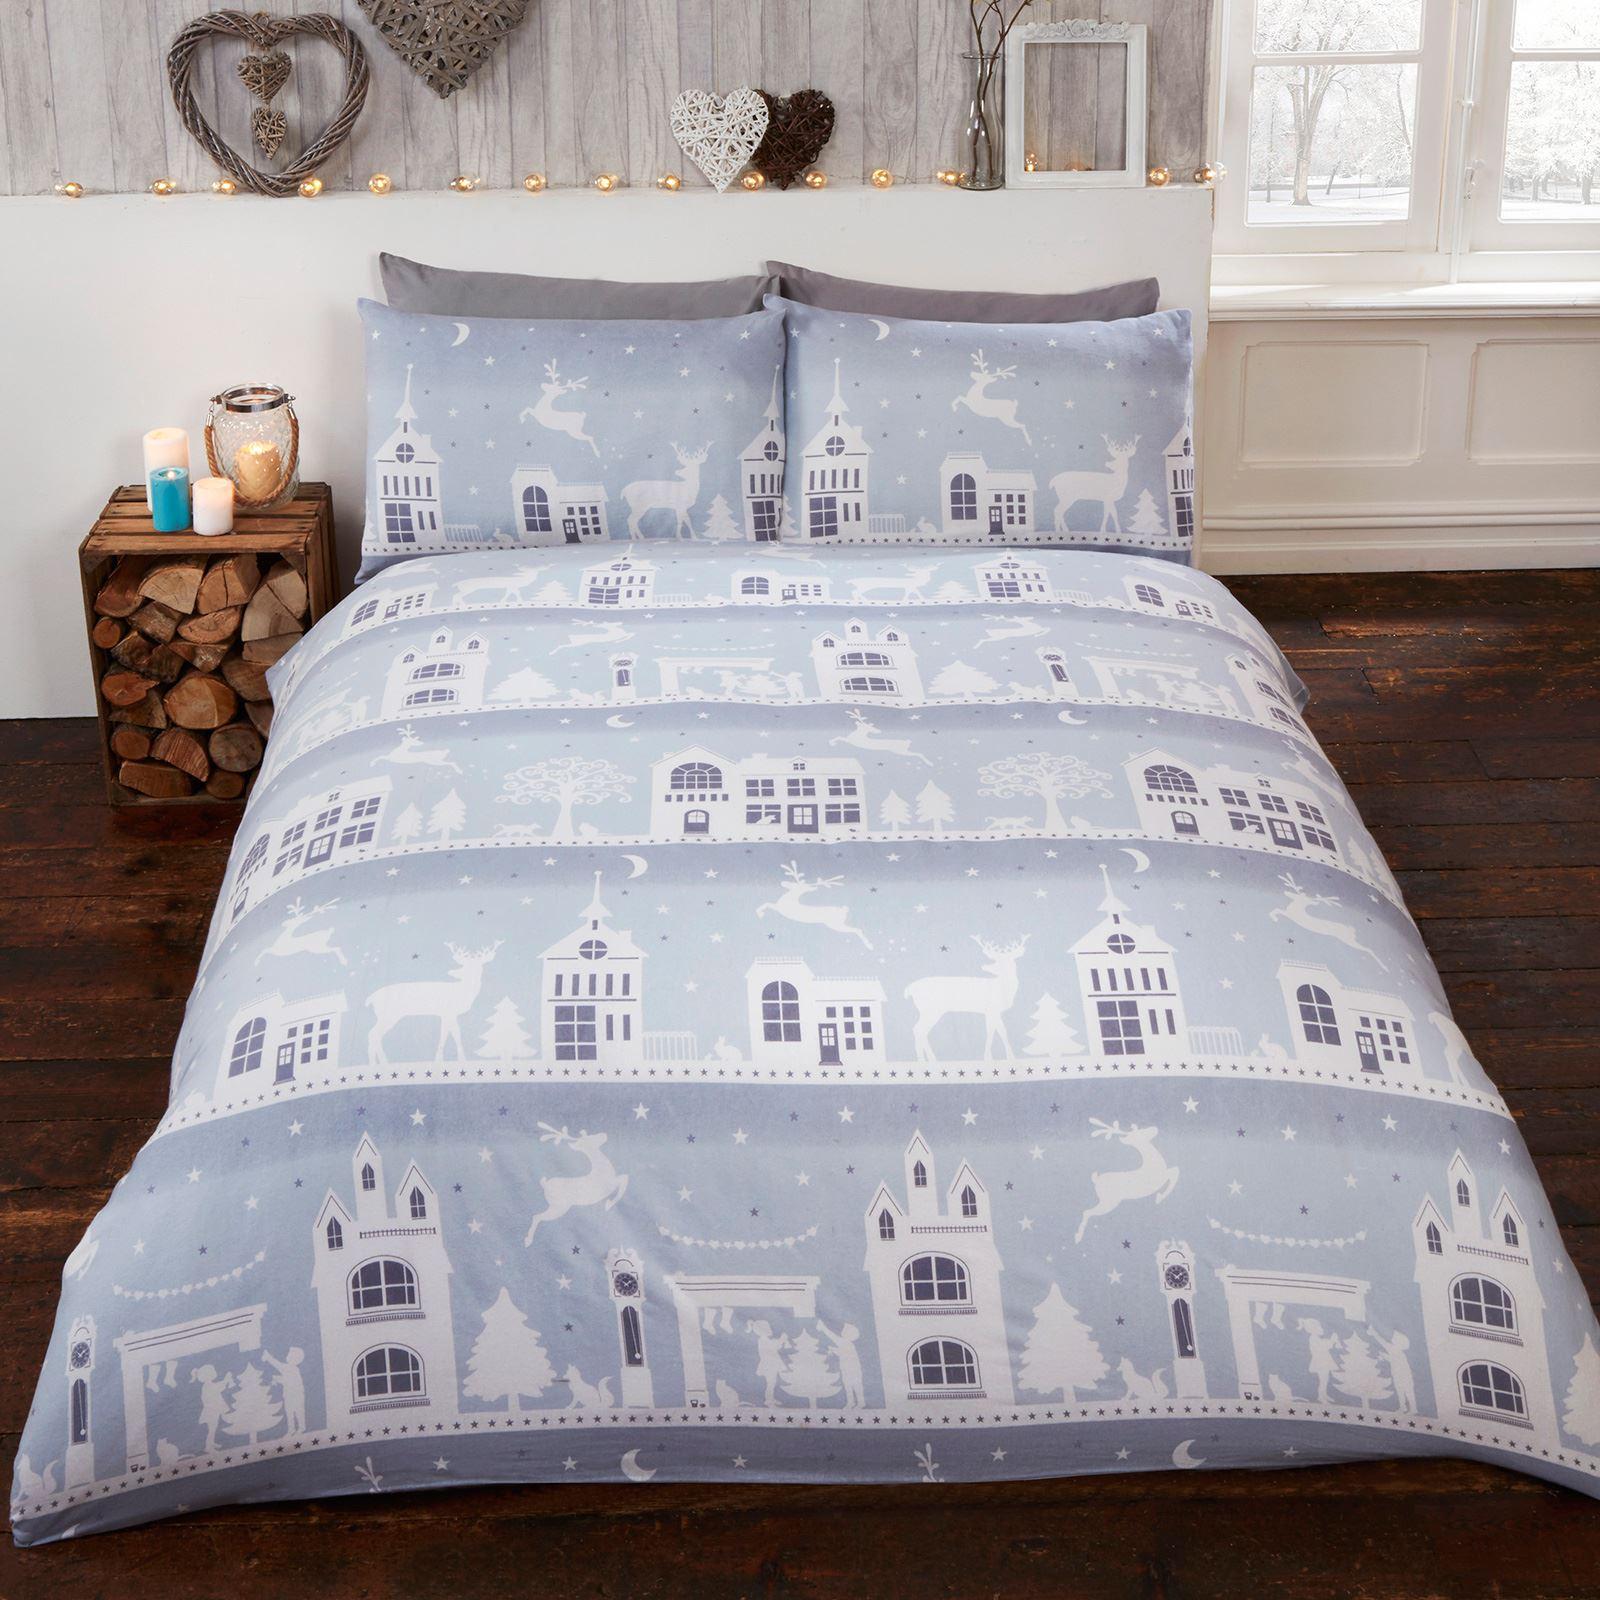 christmas festive duvet cover sets bedding adults single double king size ebay. Black Bedroom Furniture Sets. Home Design Ideas